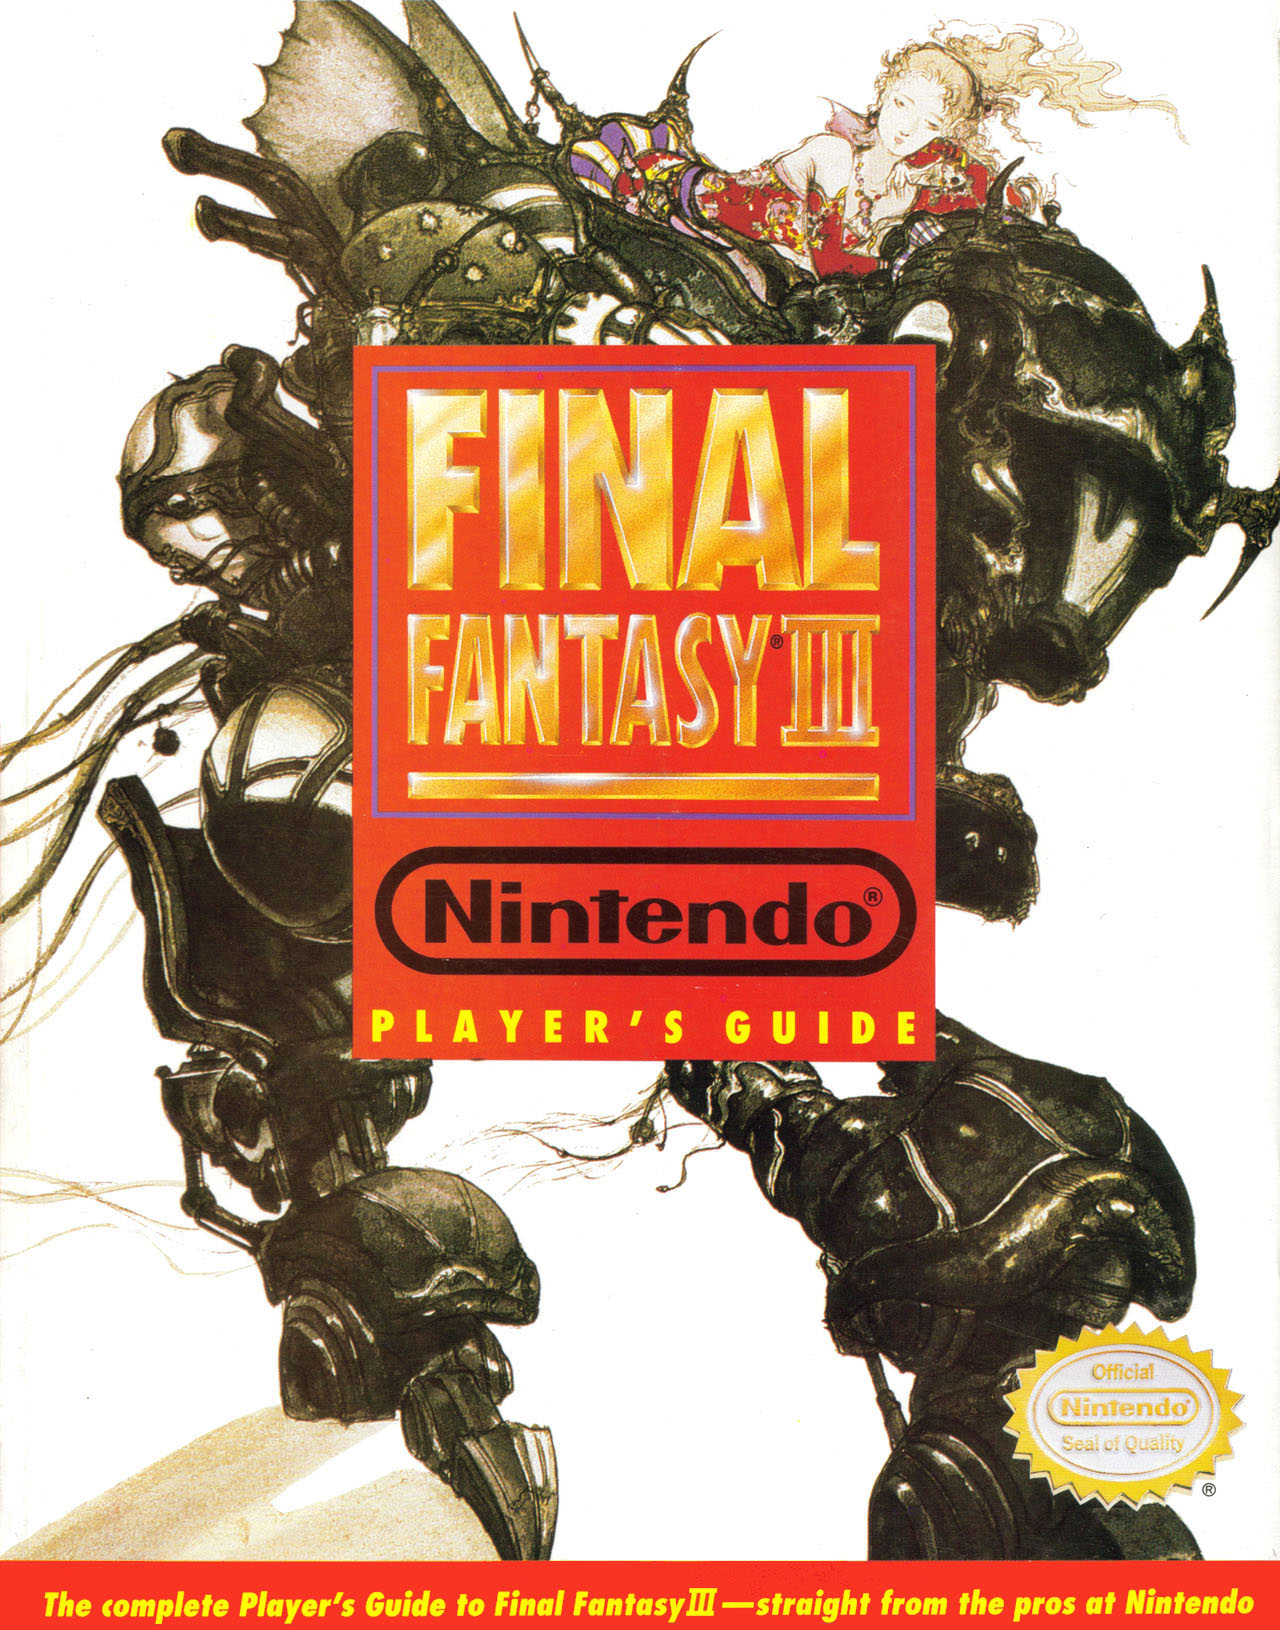 Final Fantasy III Nintendo Player's Guide